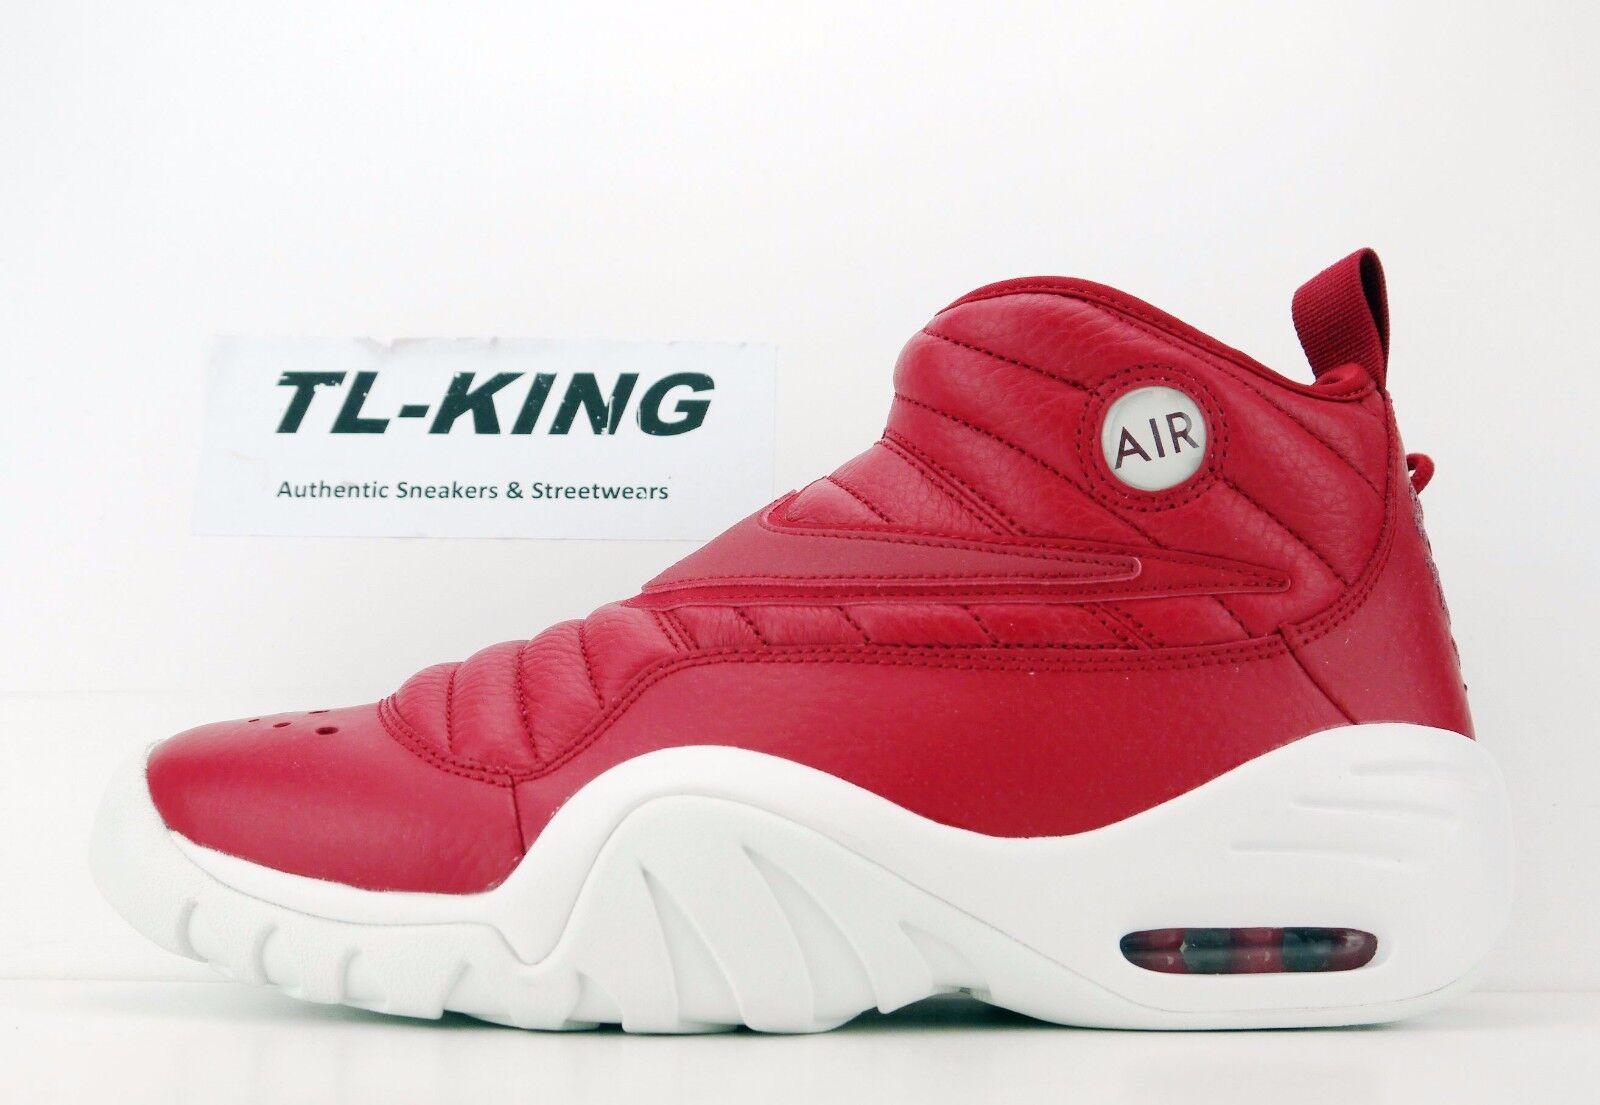 Nike Air Shake Ndestrukt Dennis Rodman Gym Red Summit White 880869 600 Price reduction Casual wild